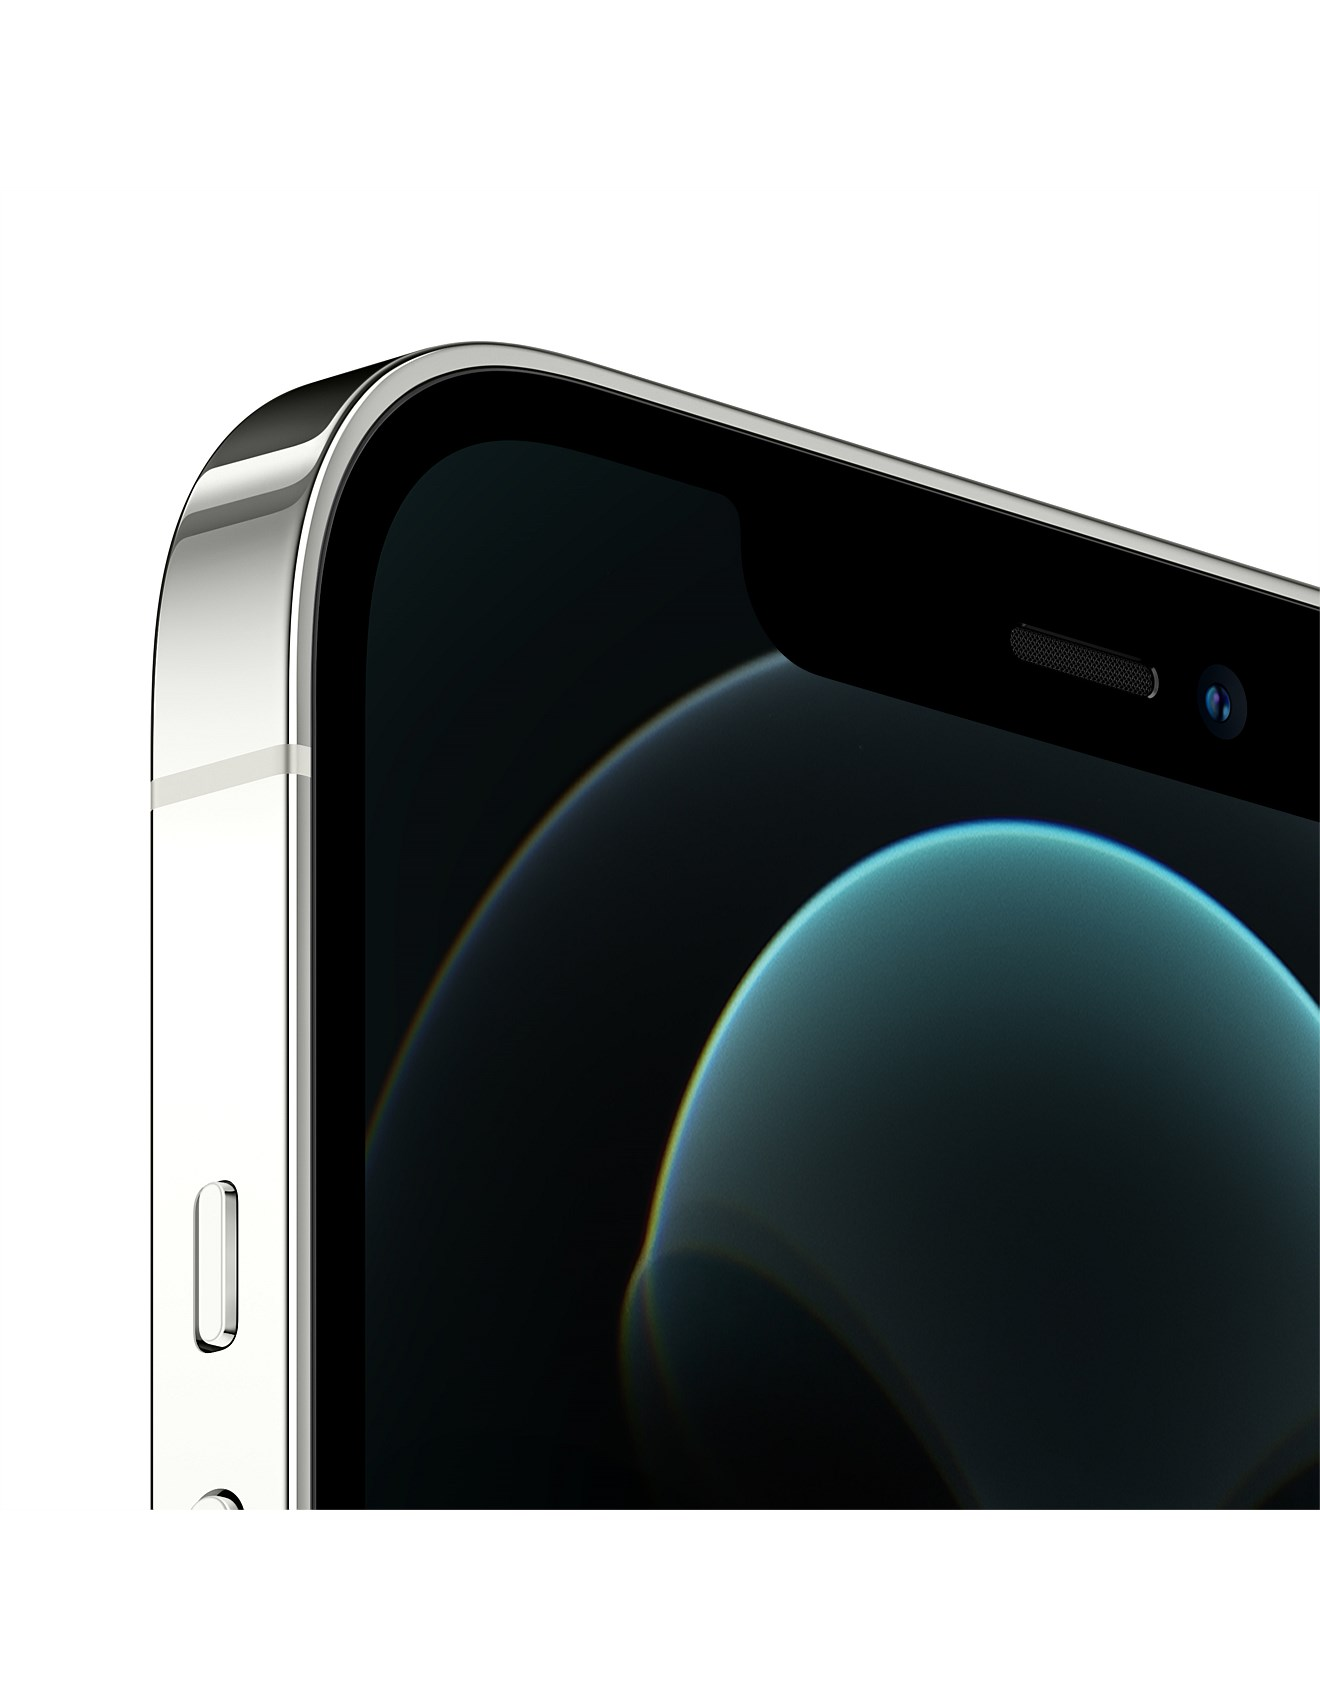 iPhone 12 Pro Max - iPhone 12 Pro Max 128GB - Silver ...